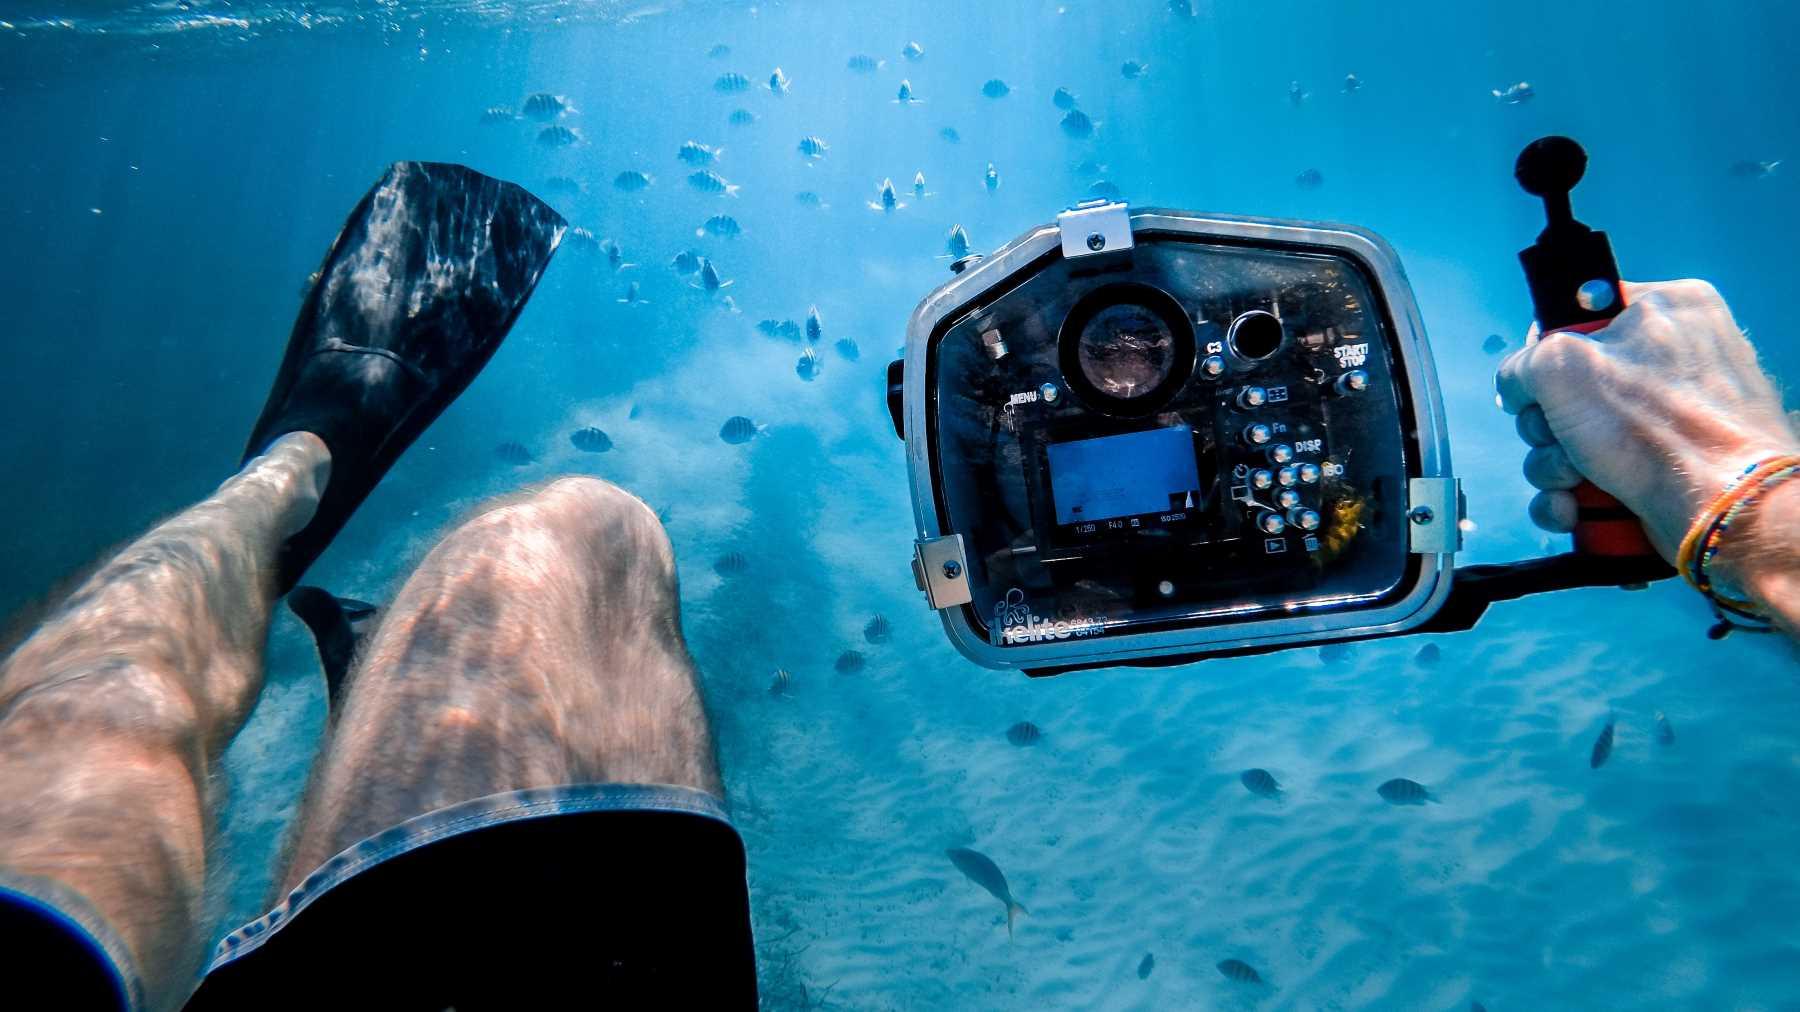 Basic underwater photography camera settings